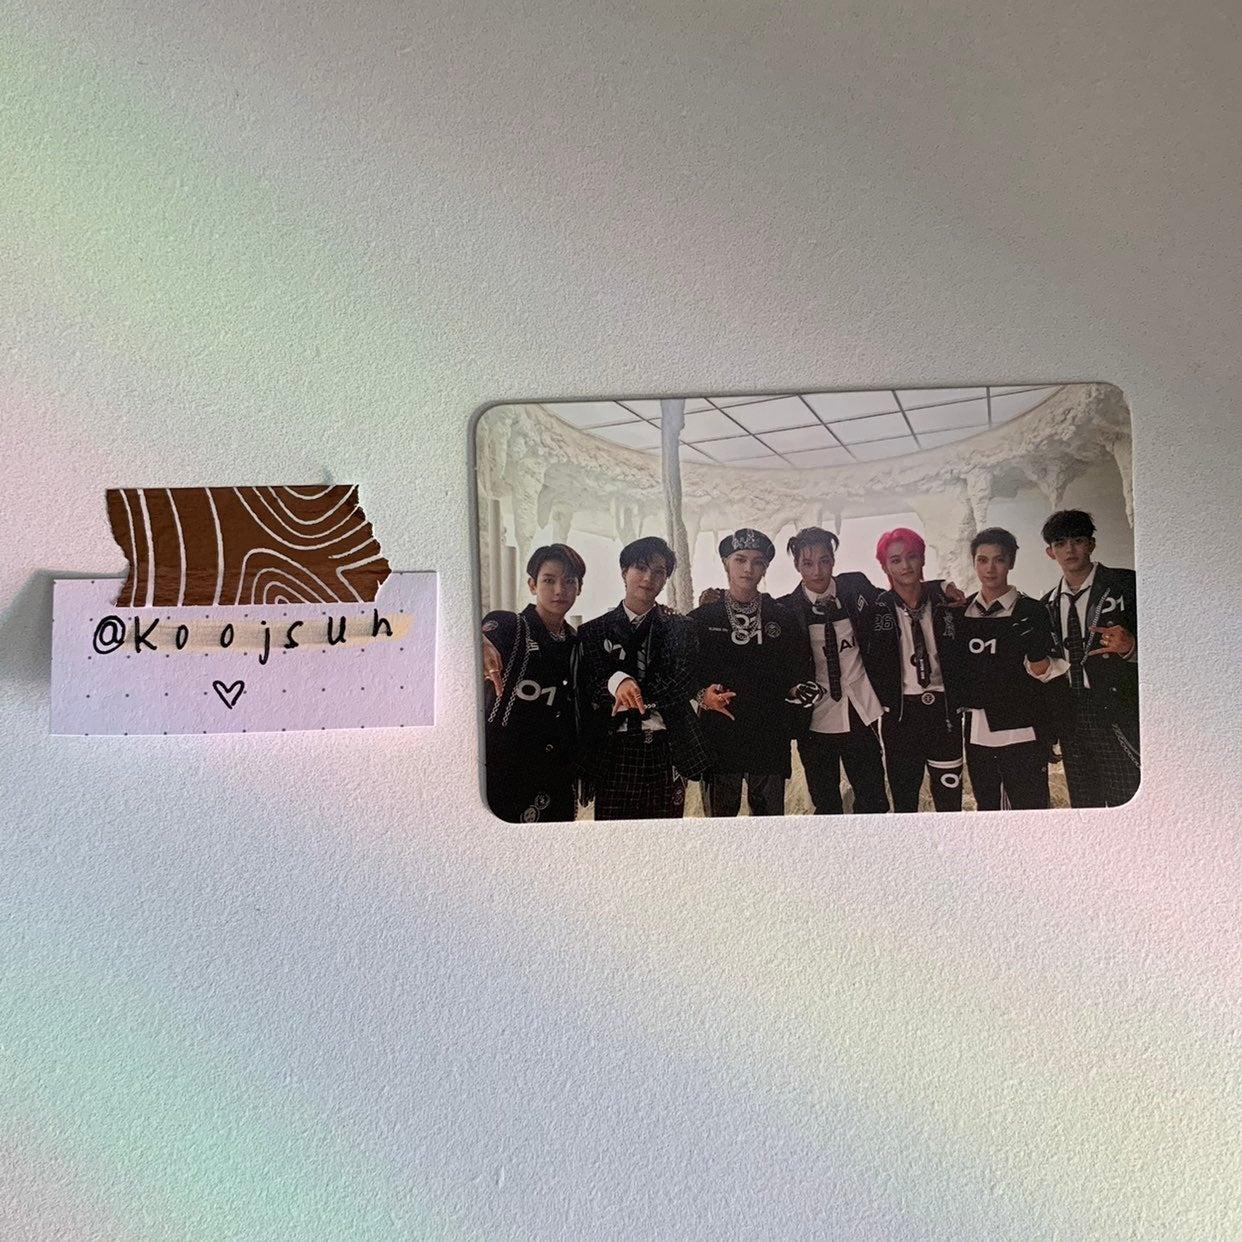 superm: super one group photocard